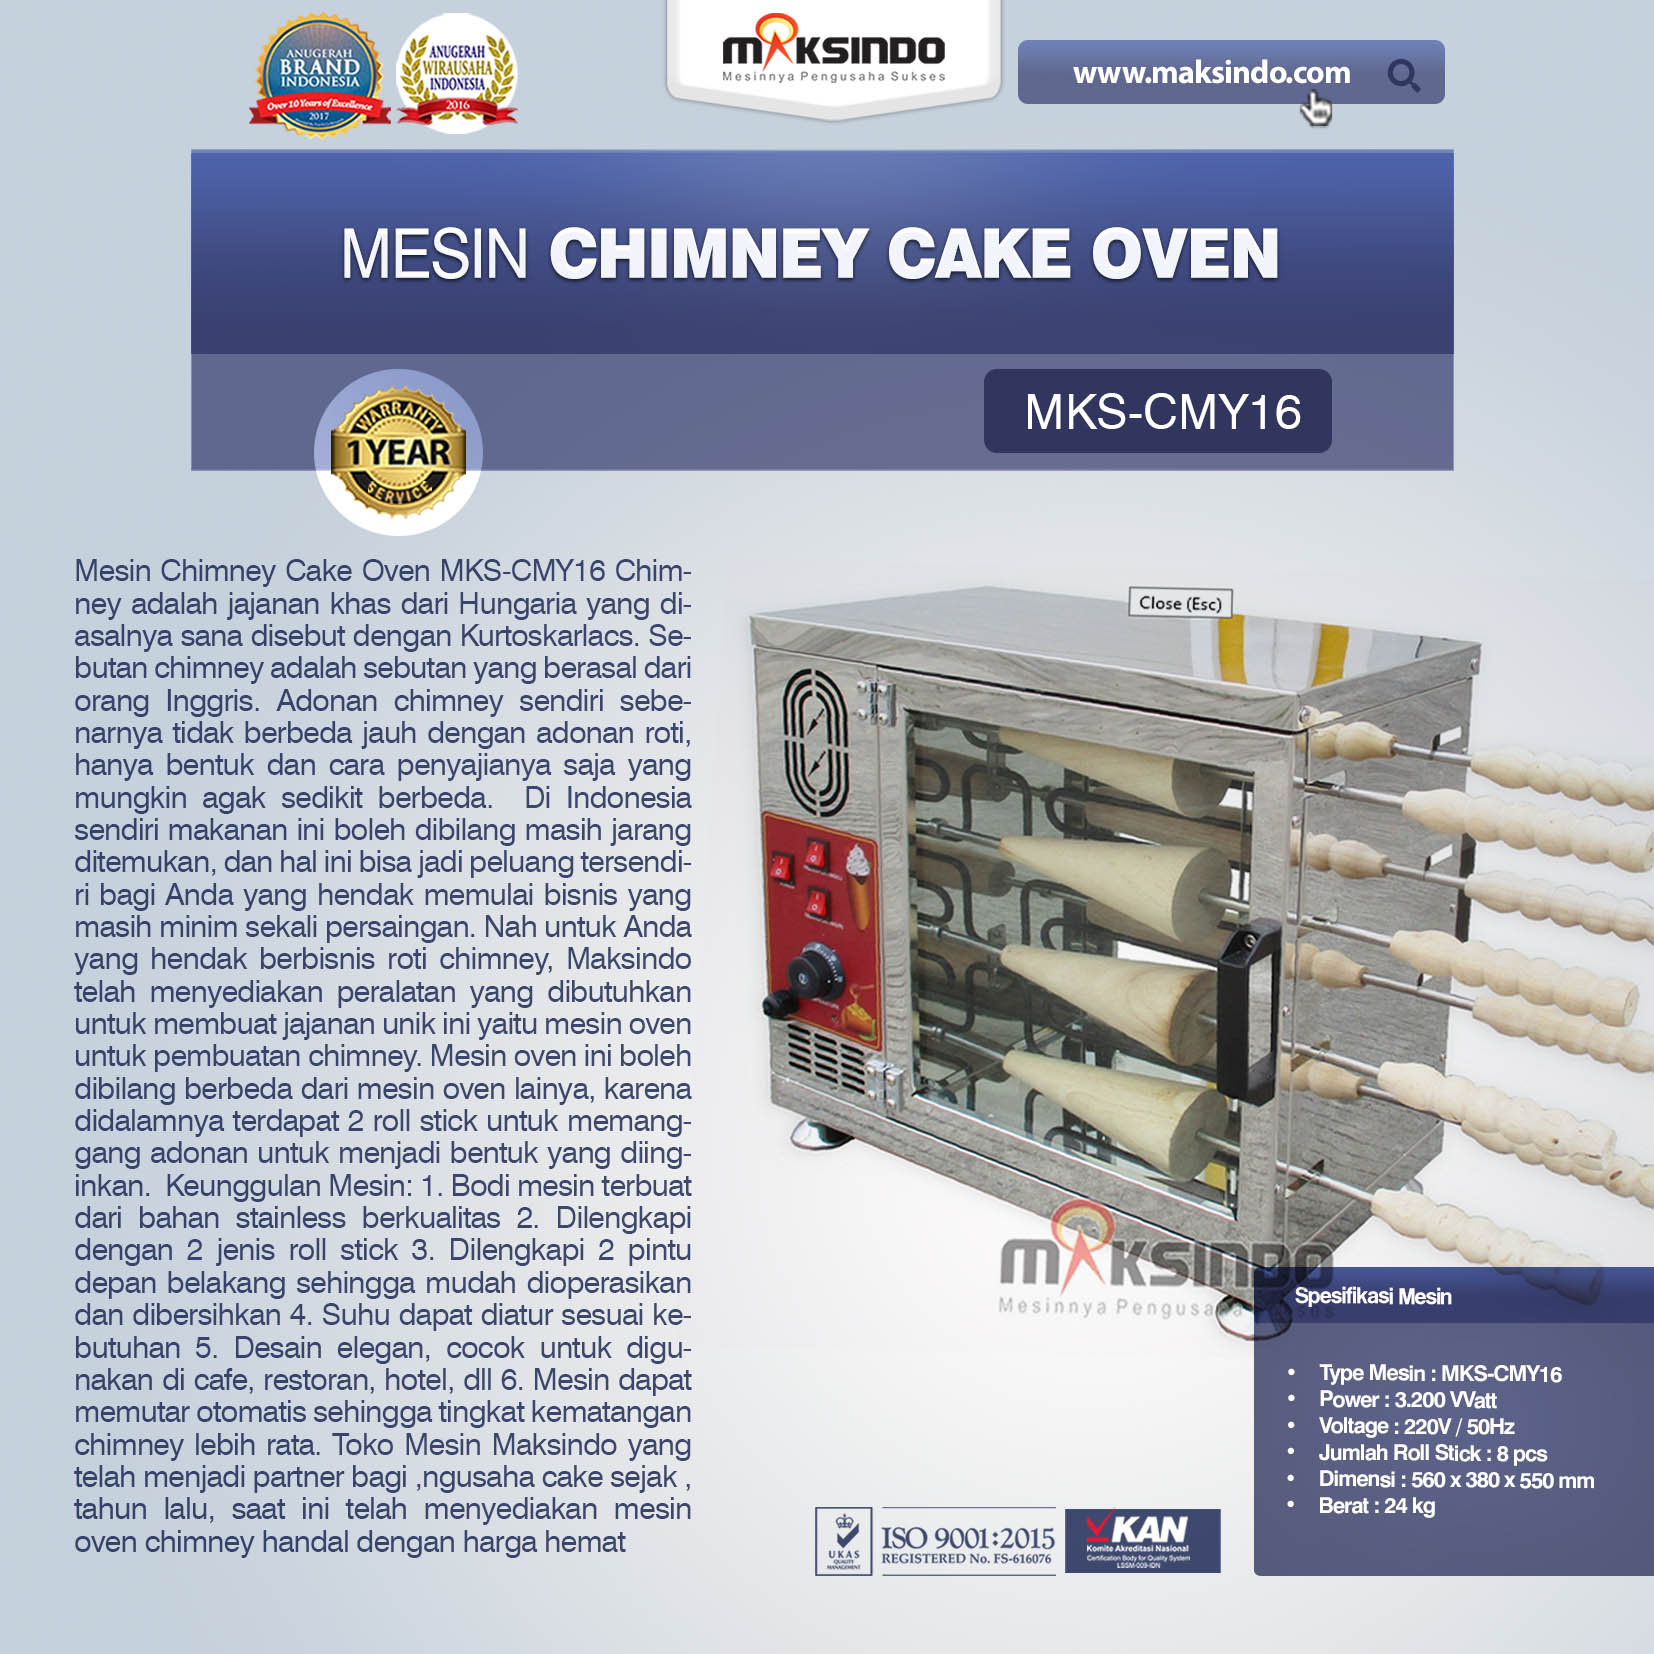 Jual Mesin Chimney Cake Oven MKS-CMY16 di Jakarta